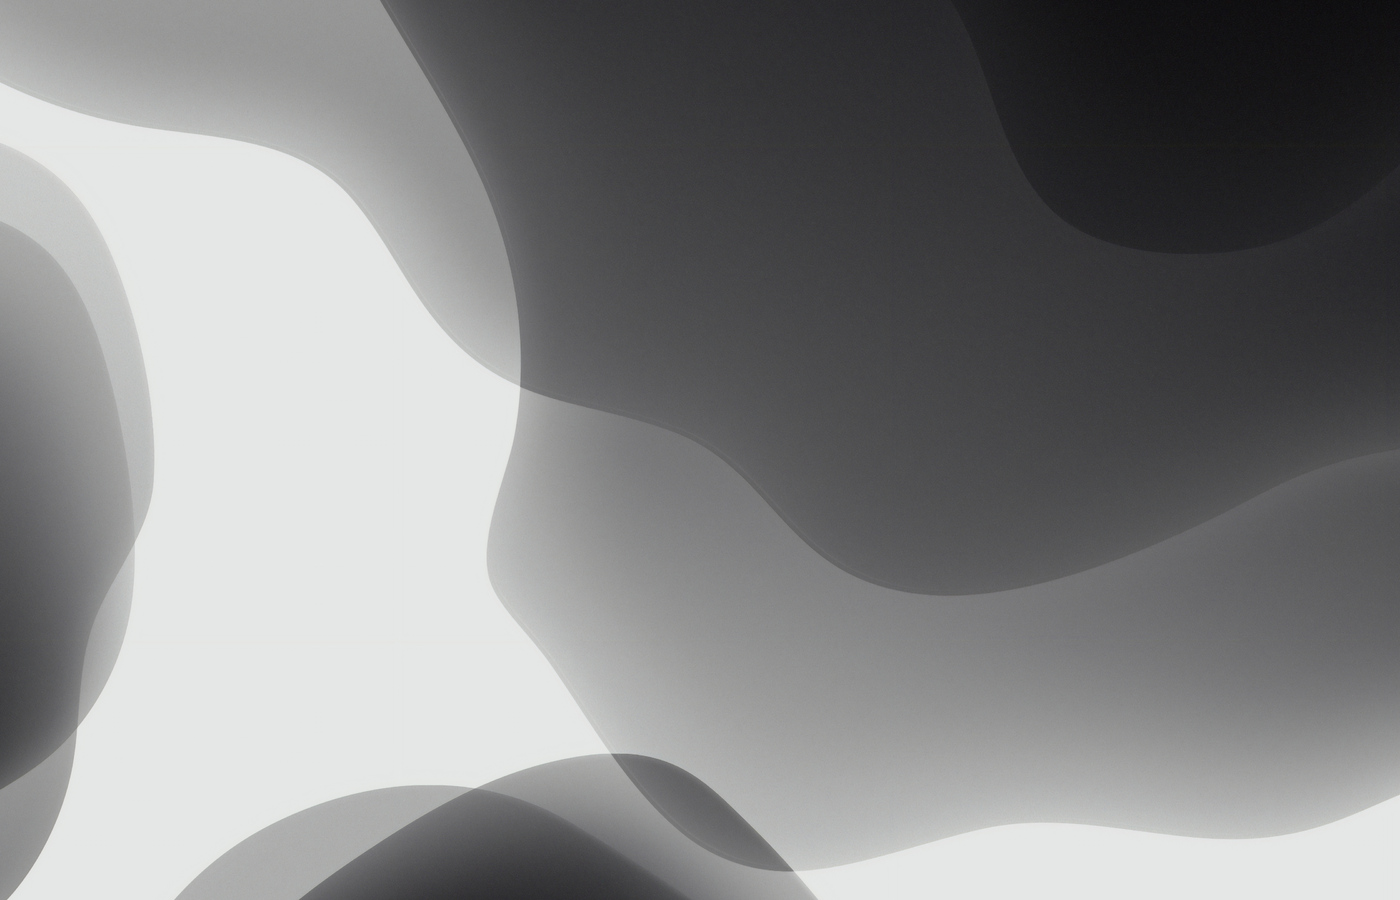 ios-13-grey-white-5k-z6.jpg